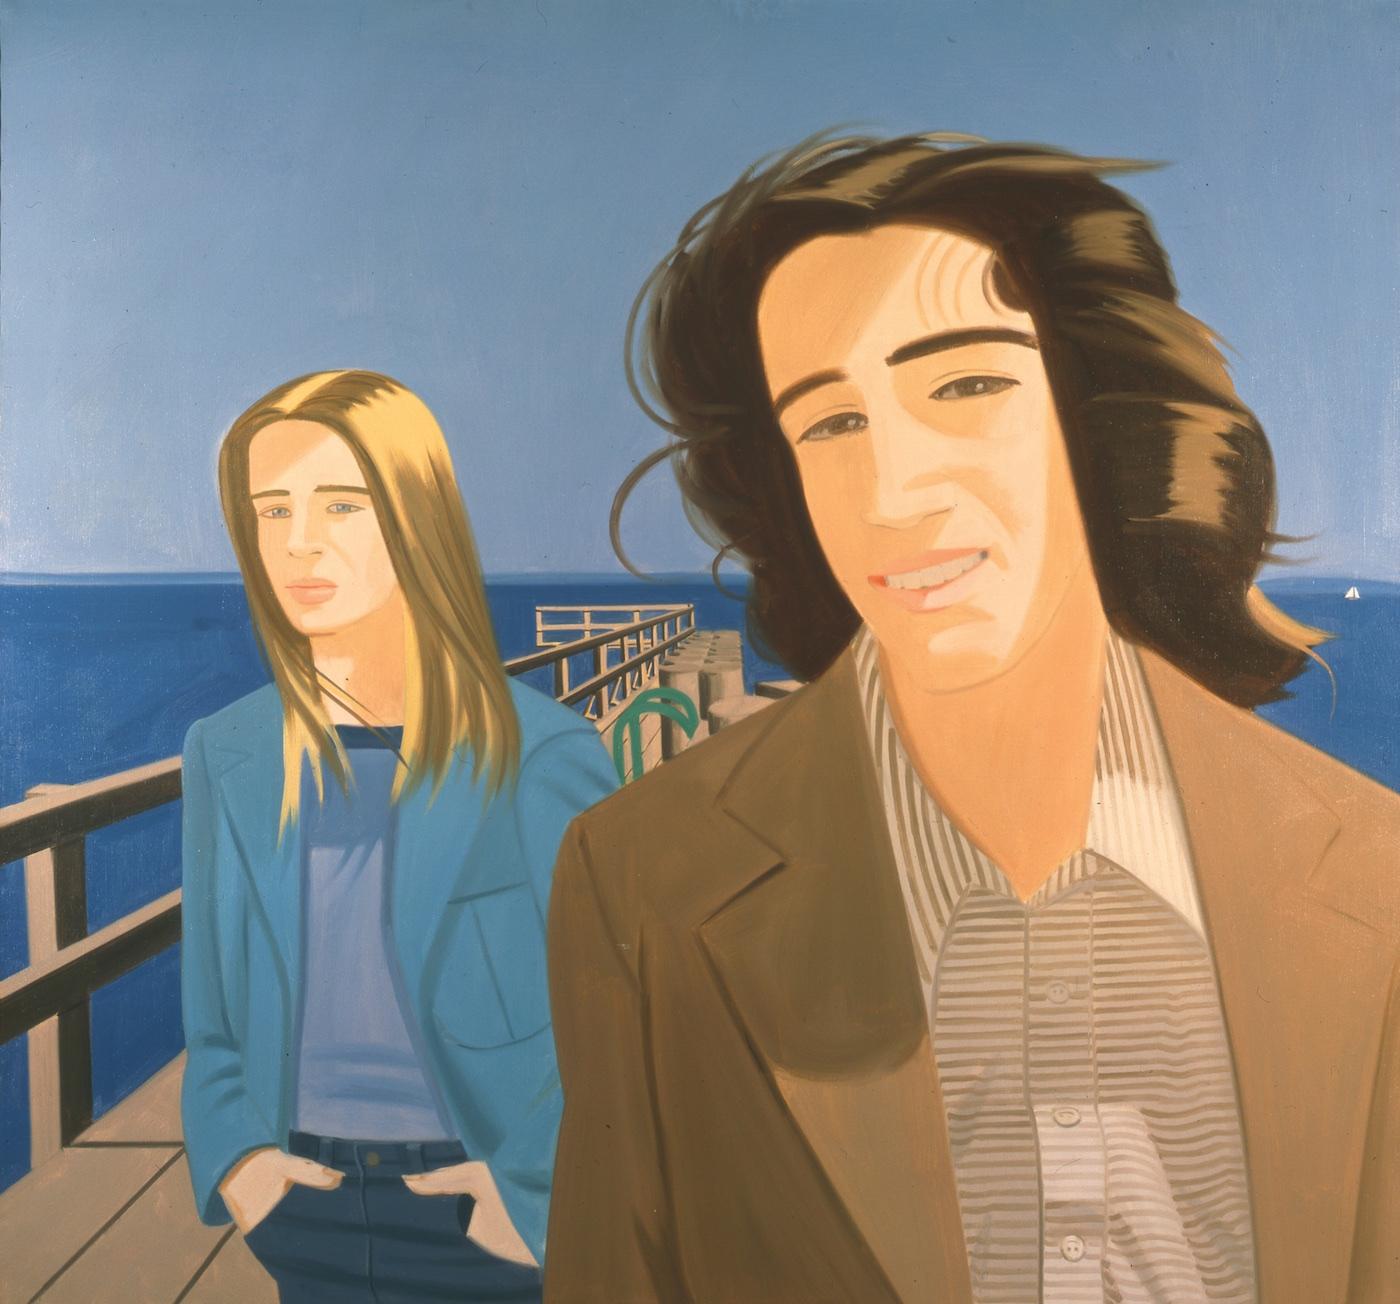 Alex Katz, Islesboro Ferry Slip, 1975, oil on linen, 78 x 84 inches (Art © Alex Katz/Licensed by VAGA, New York, NY)